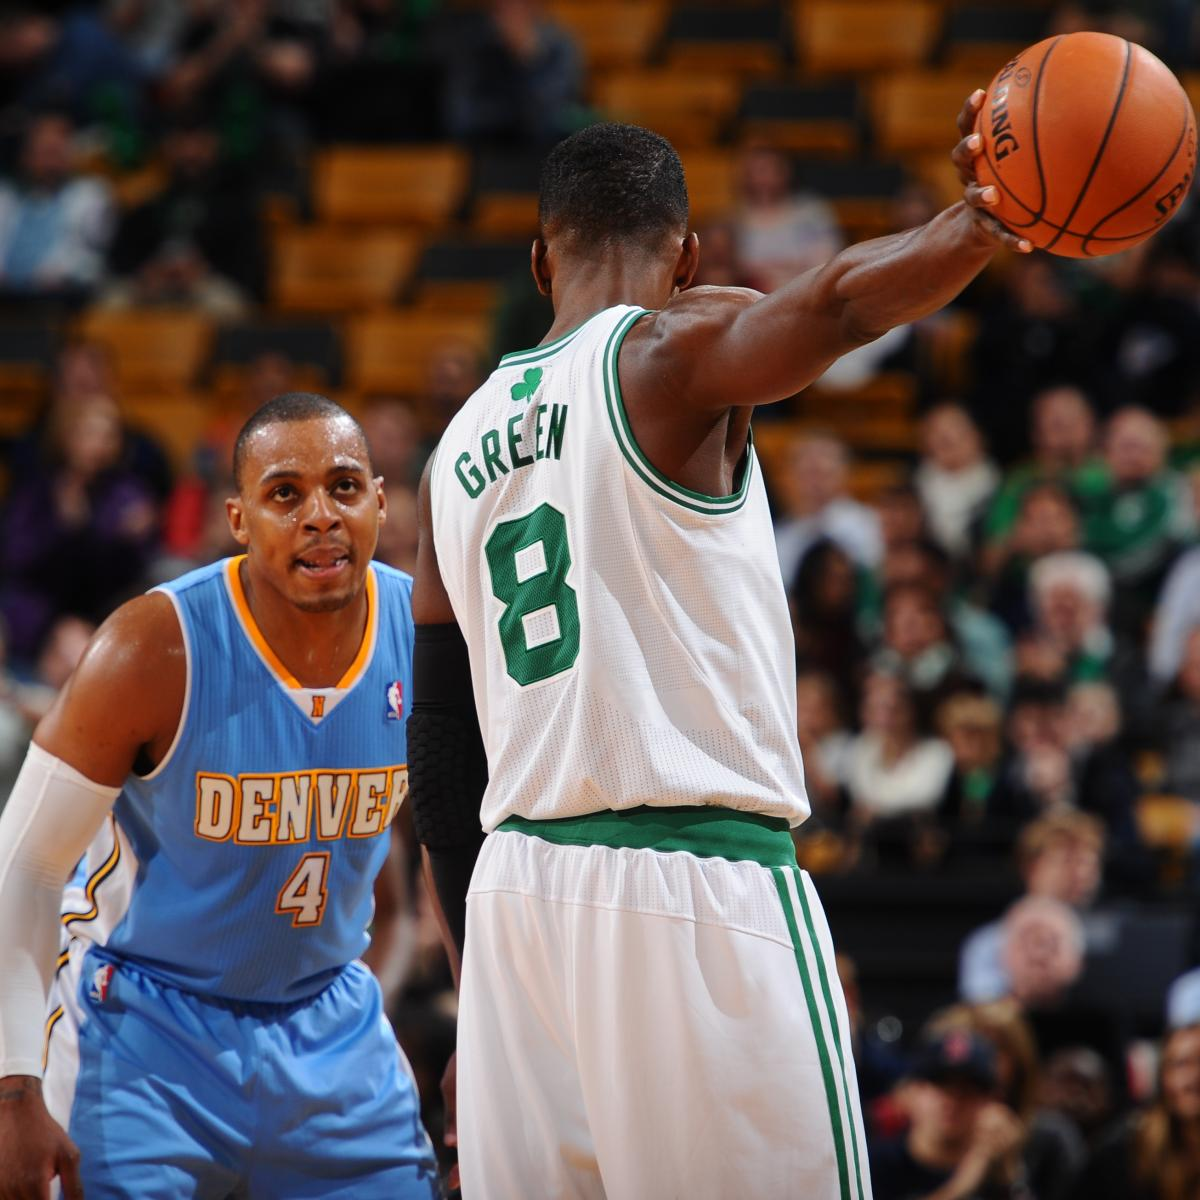 Boston Celtics Vs. Denver Nuggets: Live Score And Analysis